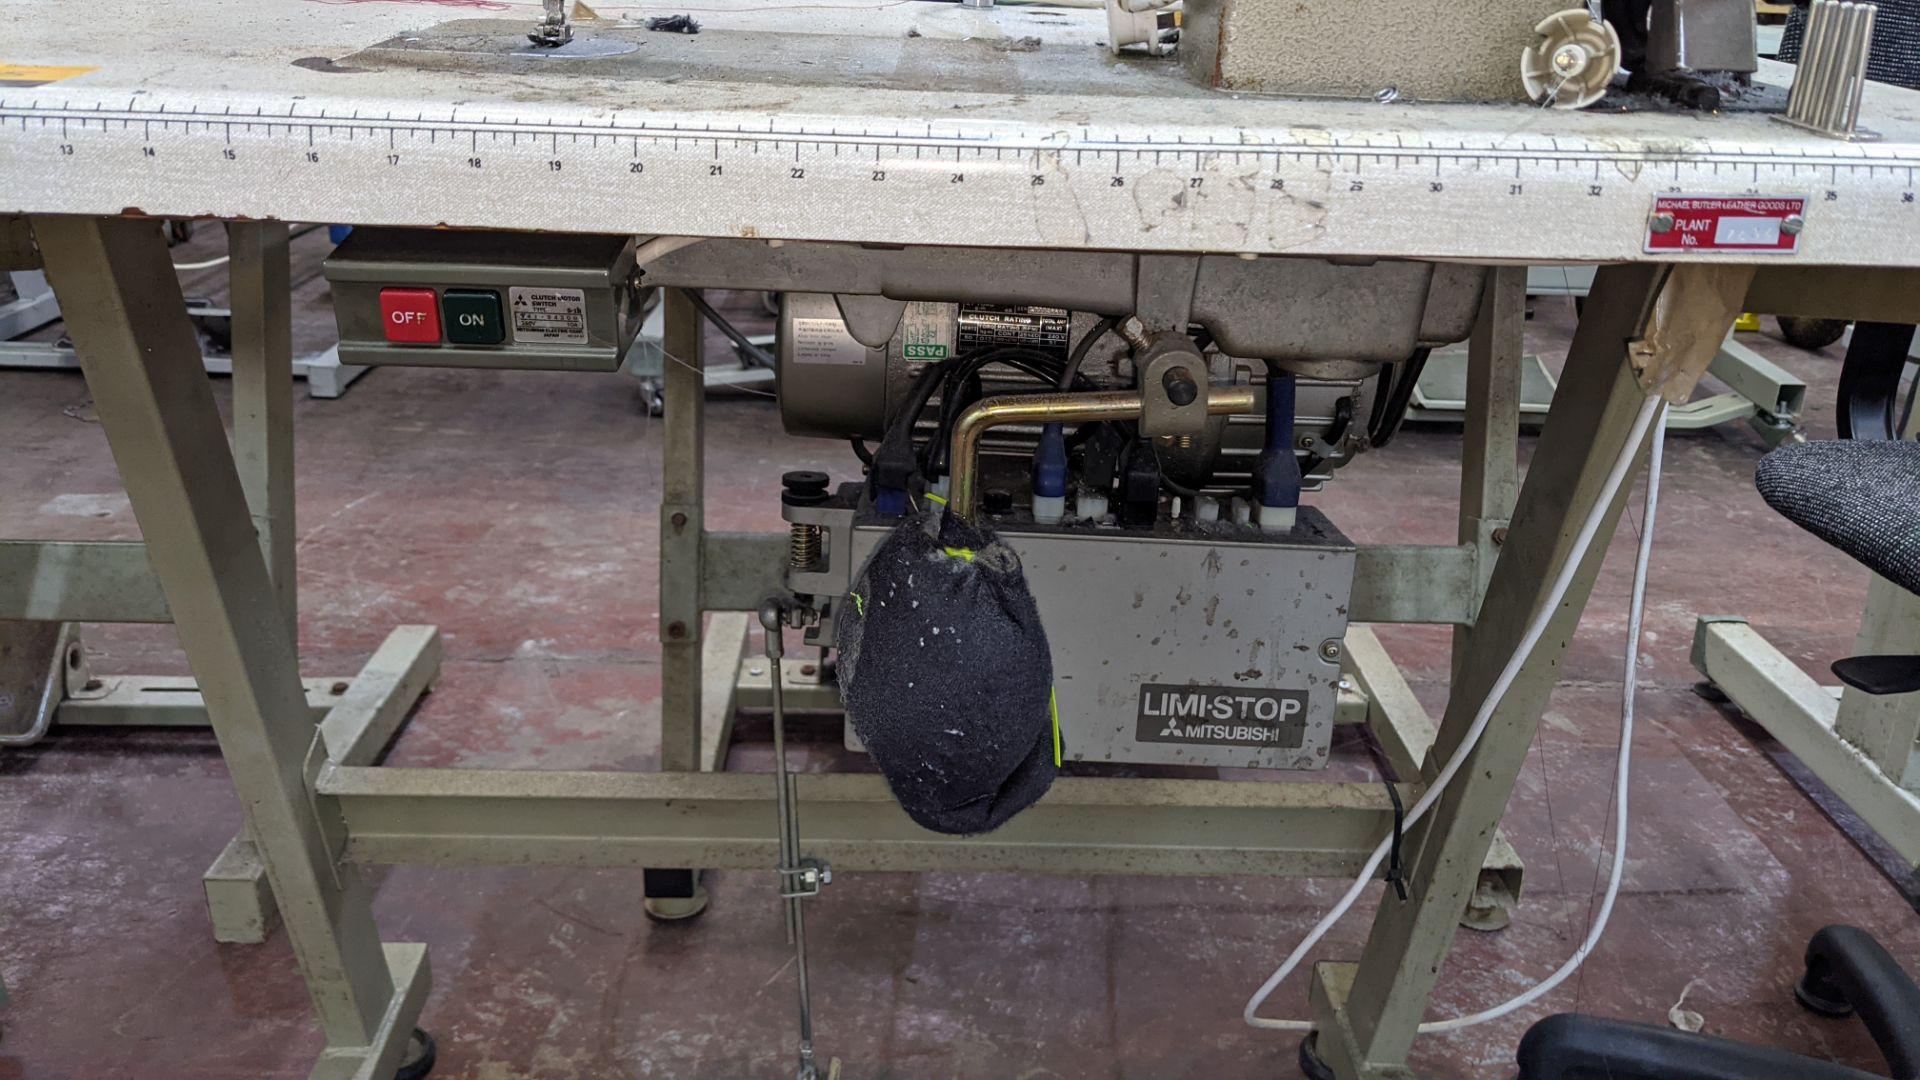 Mitsubishi LS2-180 sewing machine with Mitsubishi LF-C8 digital controller - Image 11 of 12